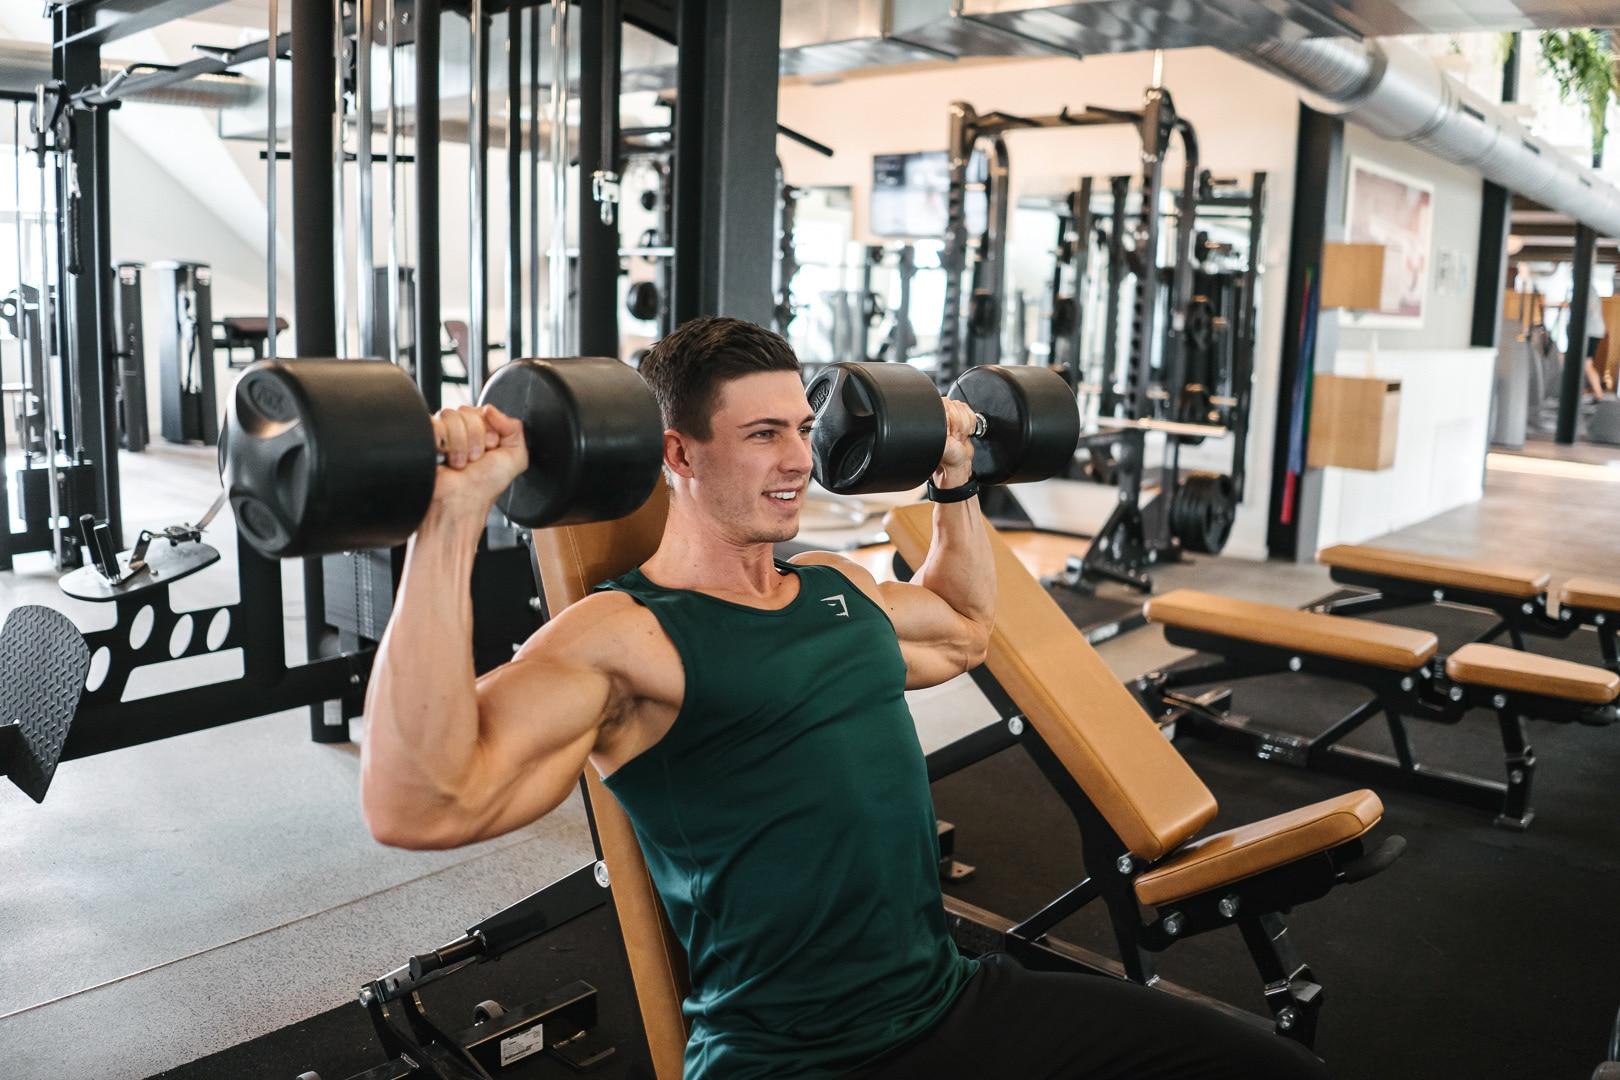 fitnessblog-fitnessblogger-fitness-blog-blogger-stuttgart-dreamteamfitness-wie-viele-wiederholungen